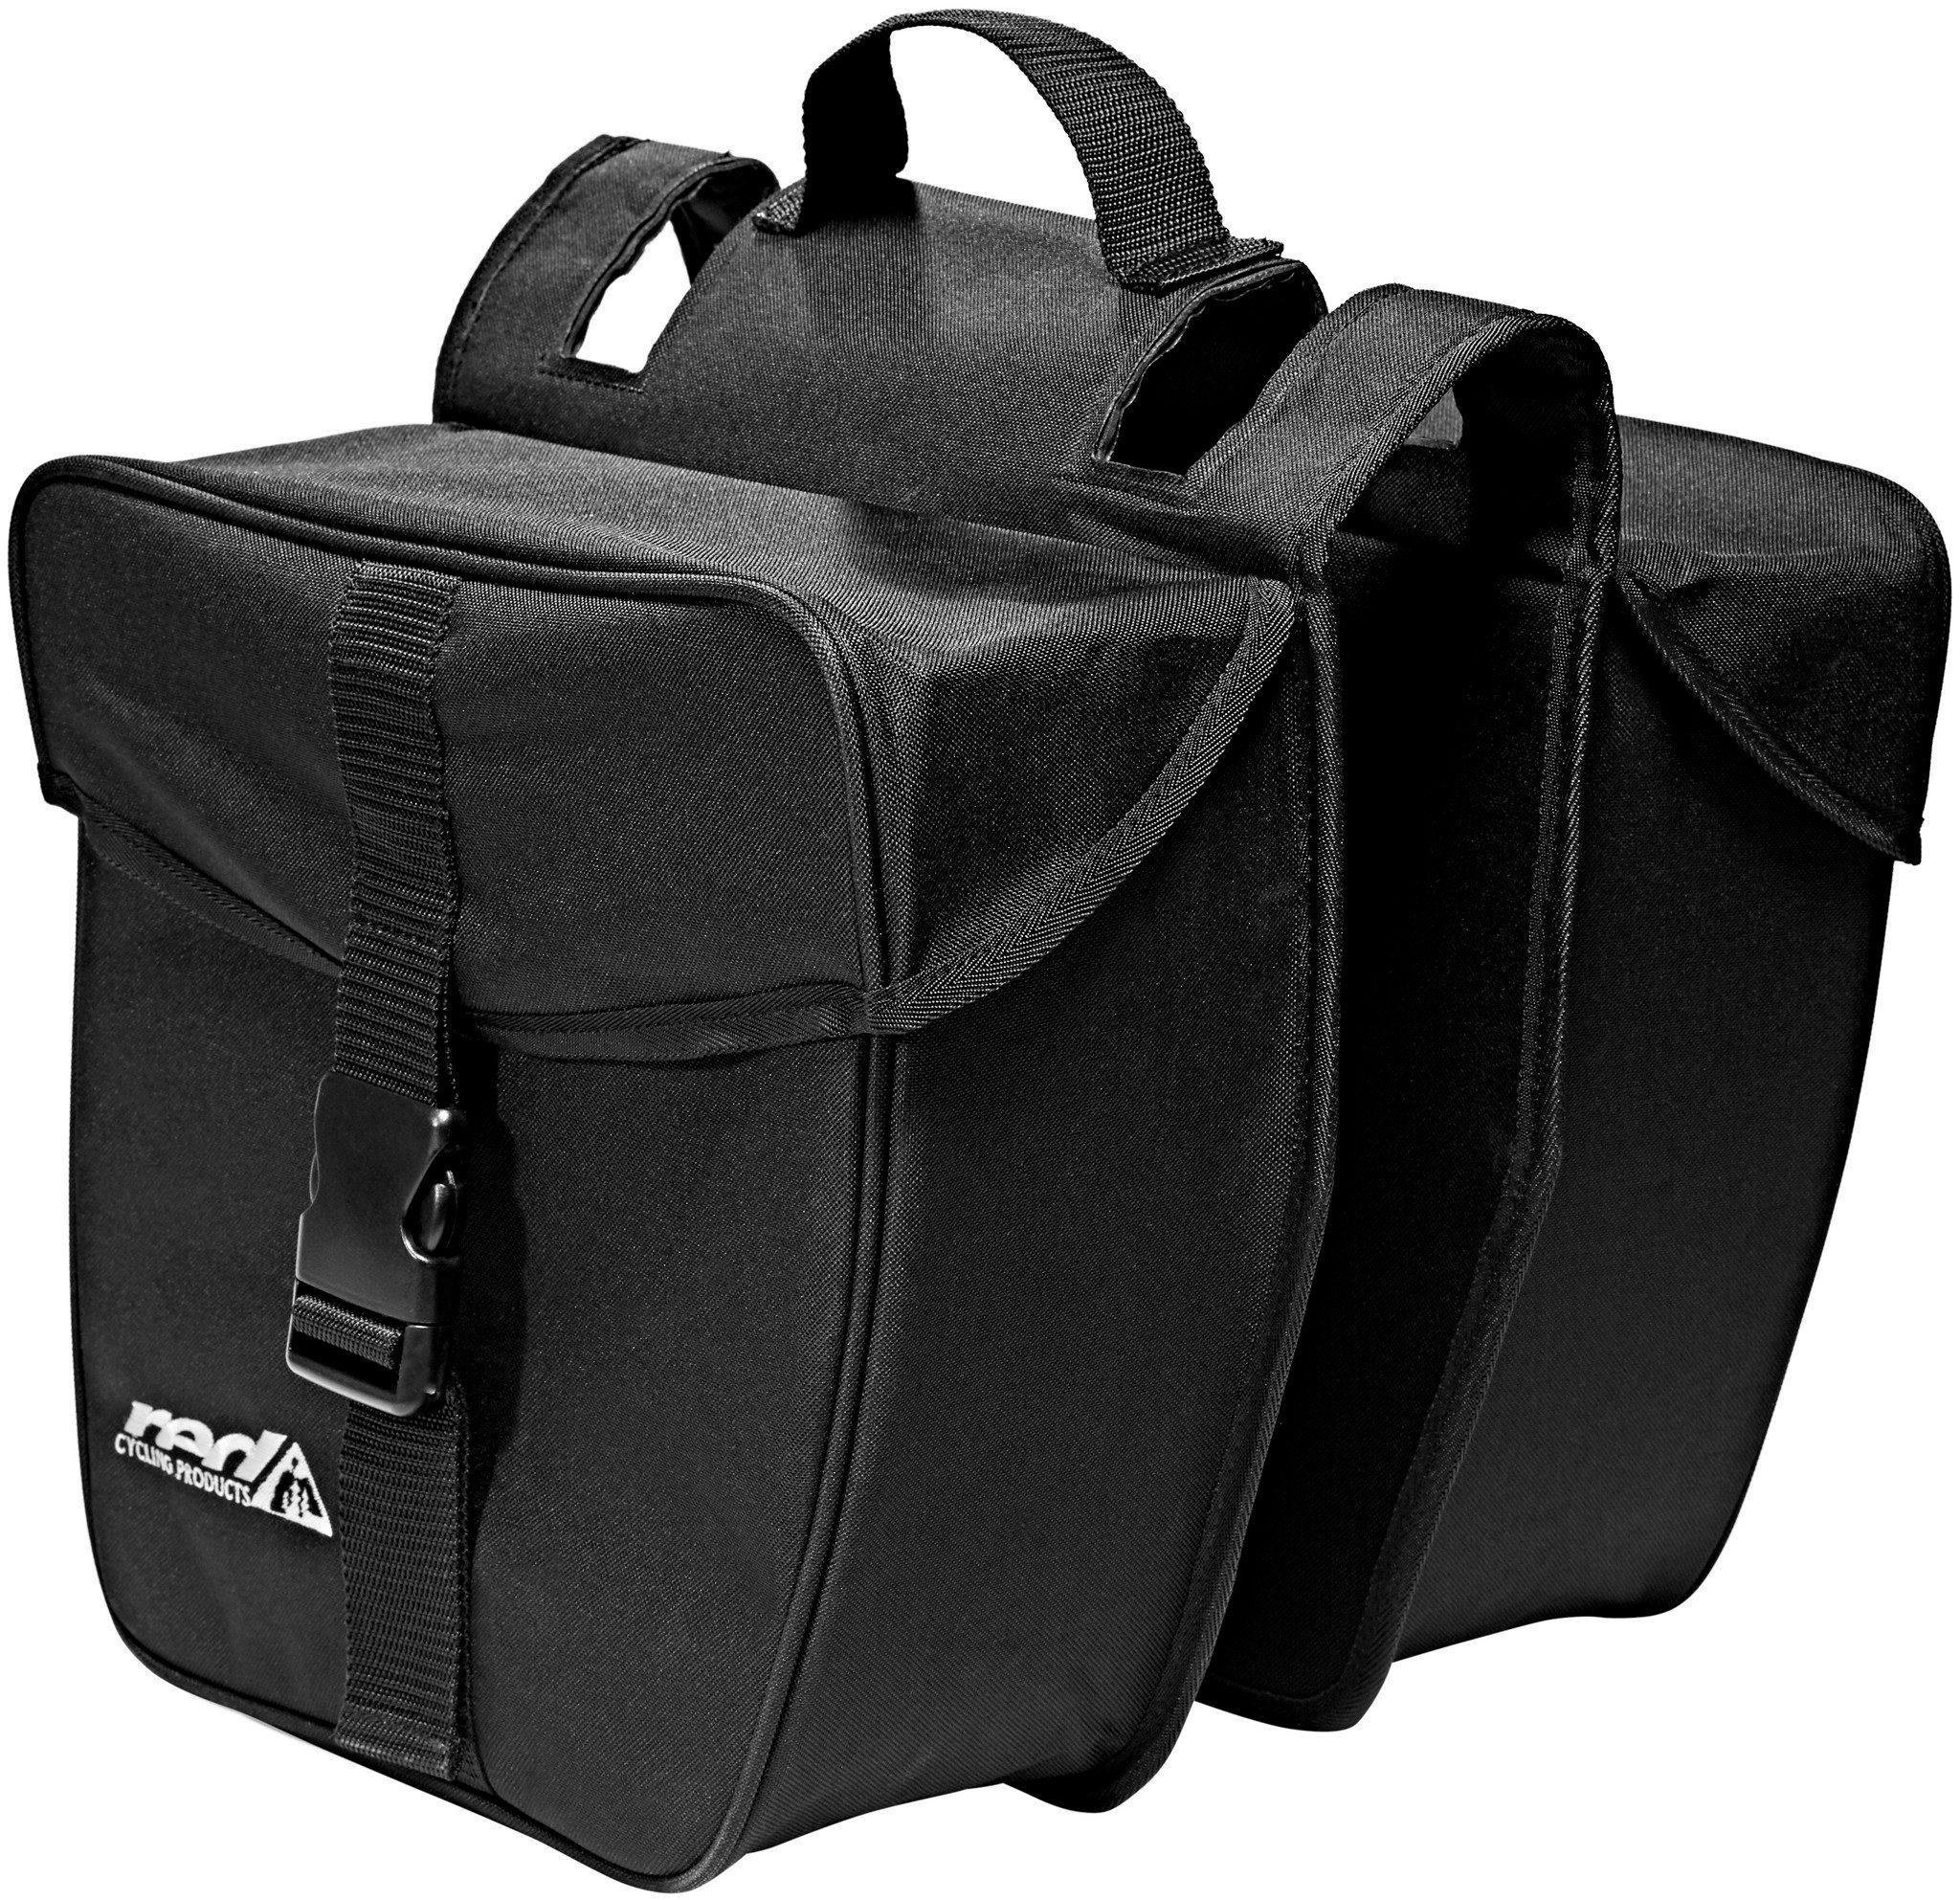 Red Cycling Products Gepäckträgertasche »Double Urban Bag Gepäckträgertasche«